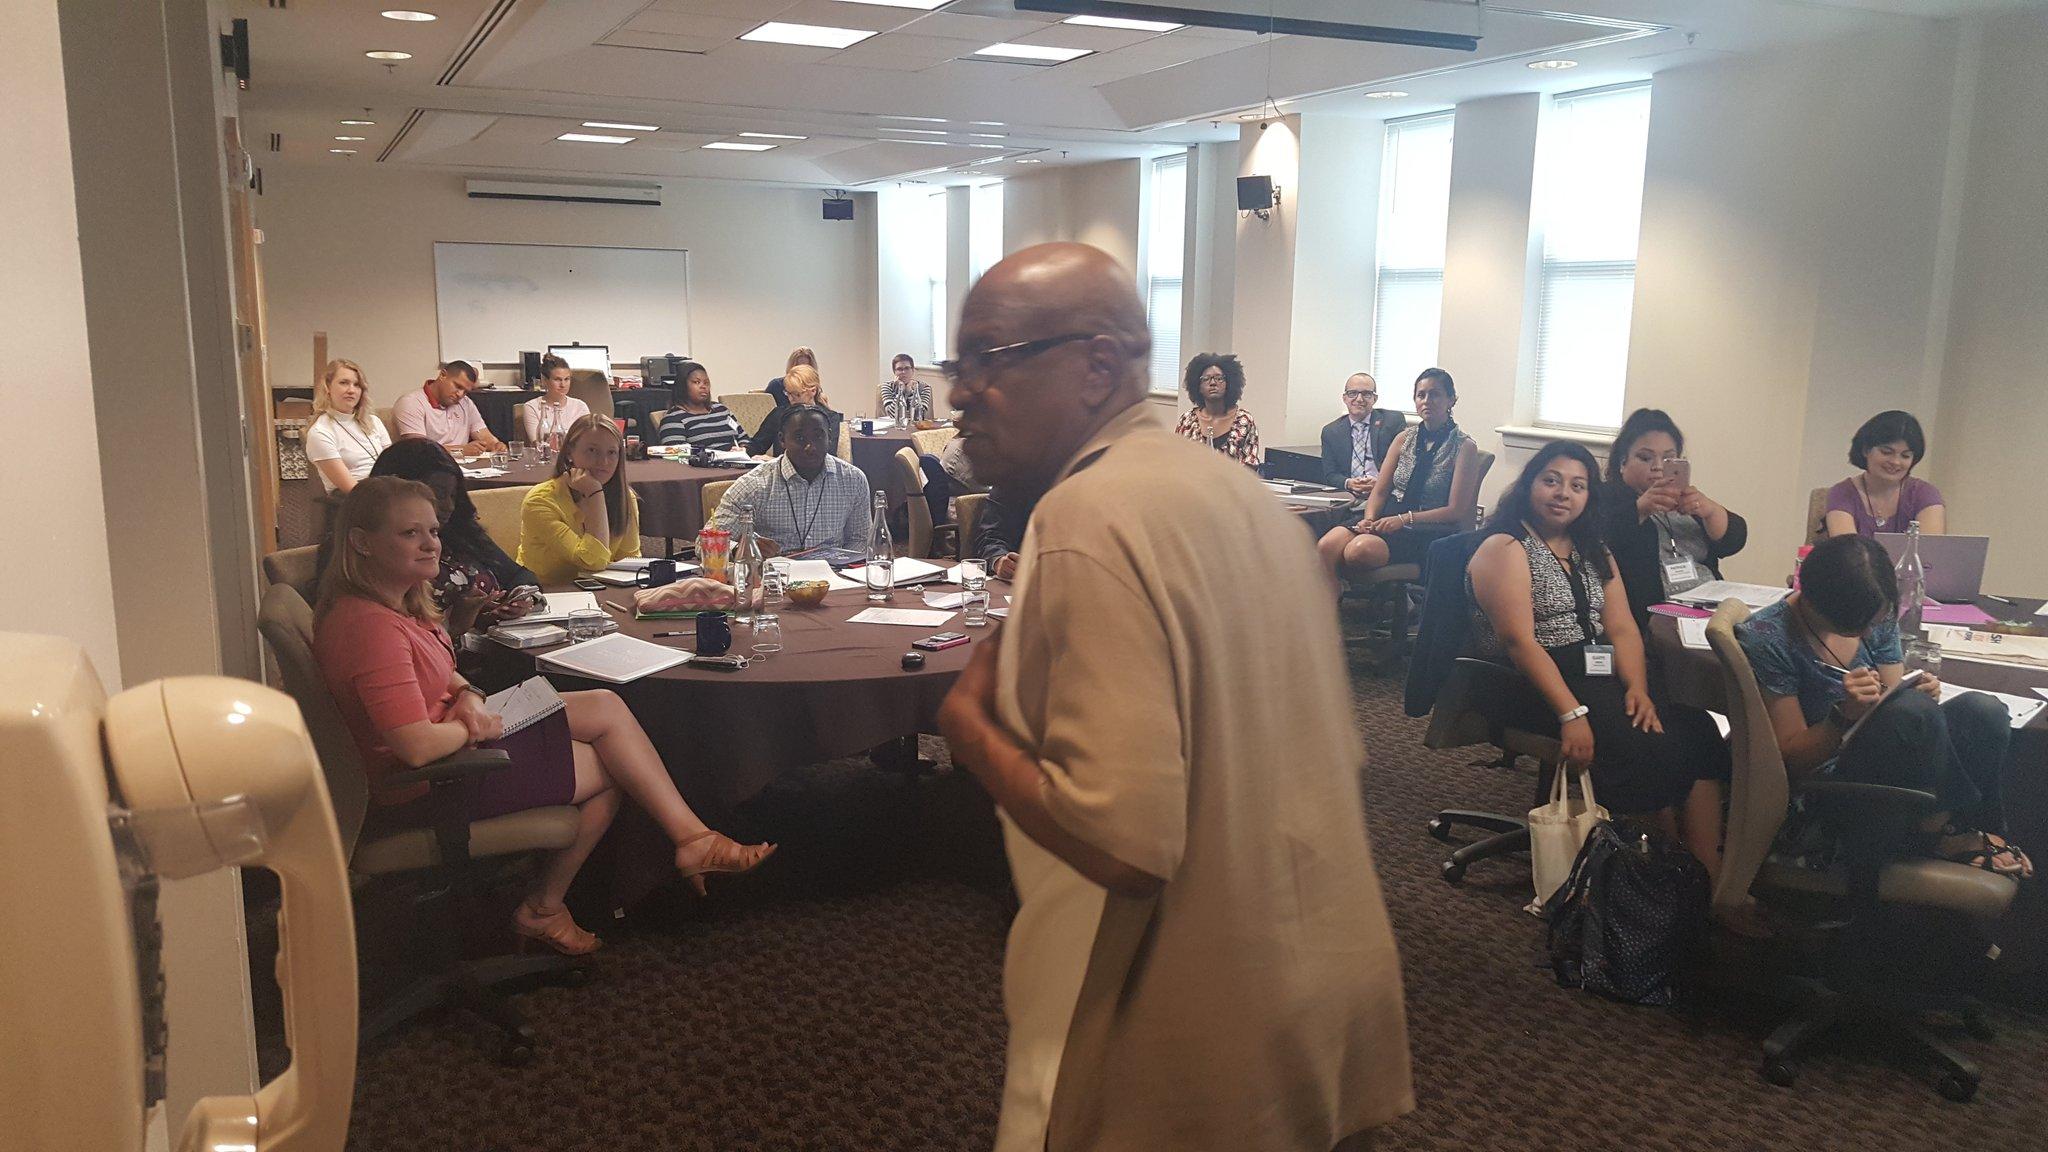 Former Congressman Ed Towns speaks at CRISP Political Boot Camp #crispbootcamp #MacroSW @nasw @laurelhitchcock @birdgirl1001 https://t.co/qF1BqiD4BP